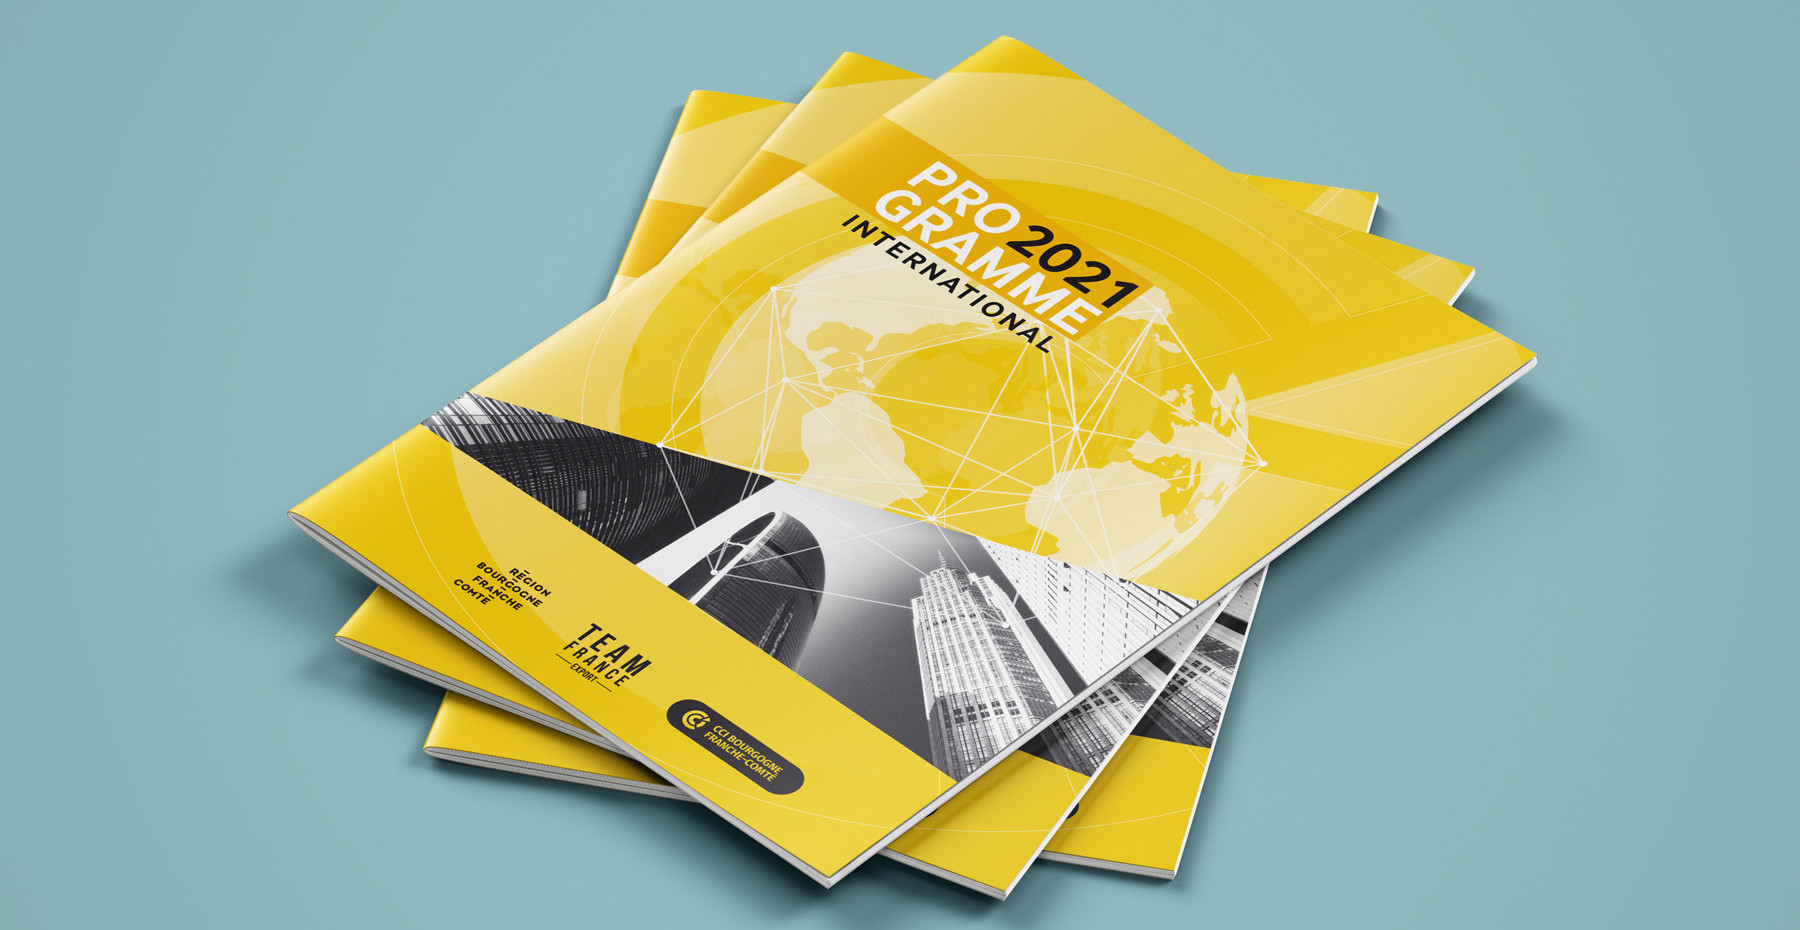 CCI international-Couverture programme 2